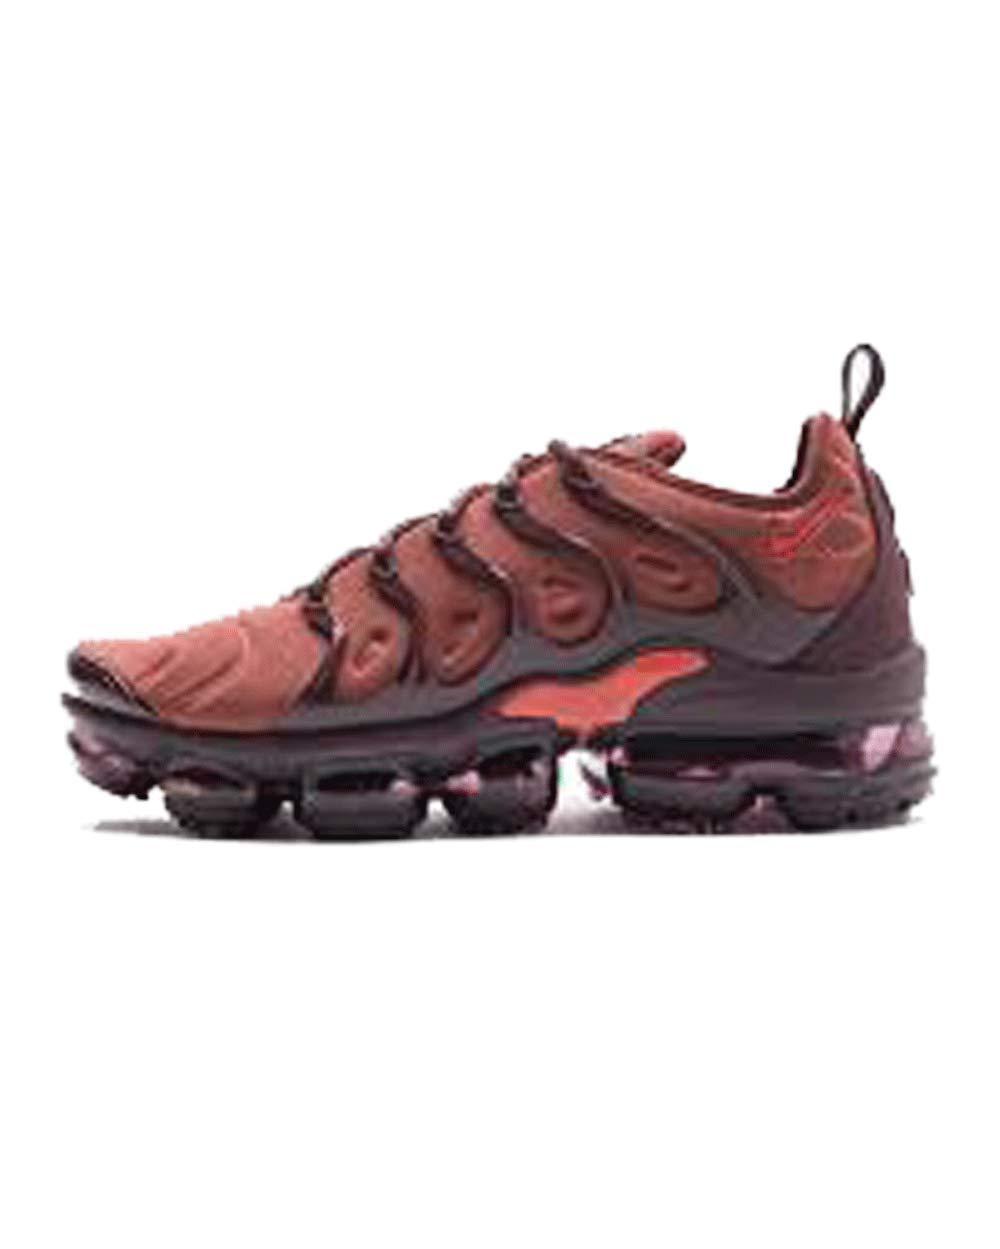 74cb34e3b973c Galleon - Nike W Air Vapormax Plus Womens Ao4550-201 Size 10